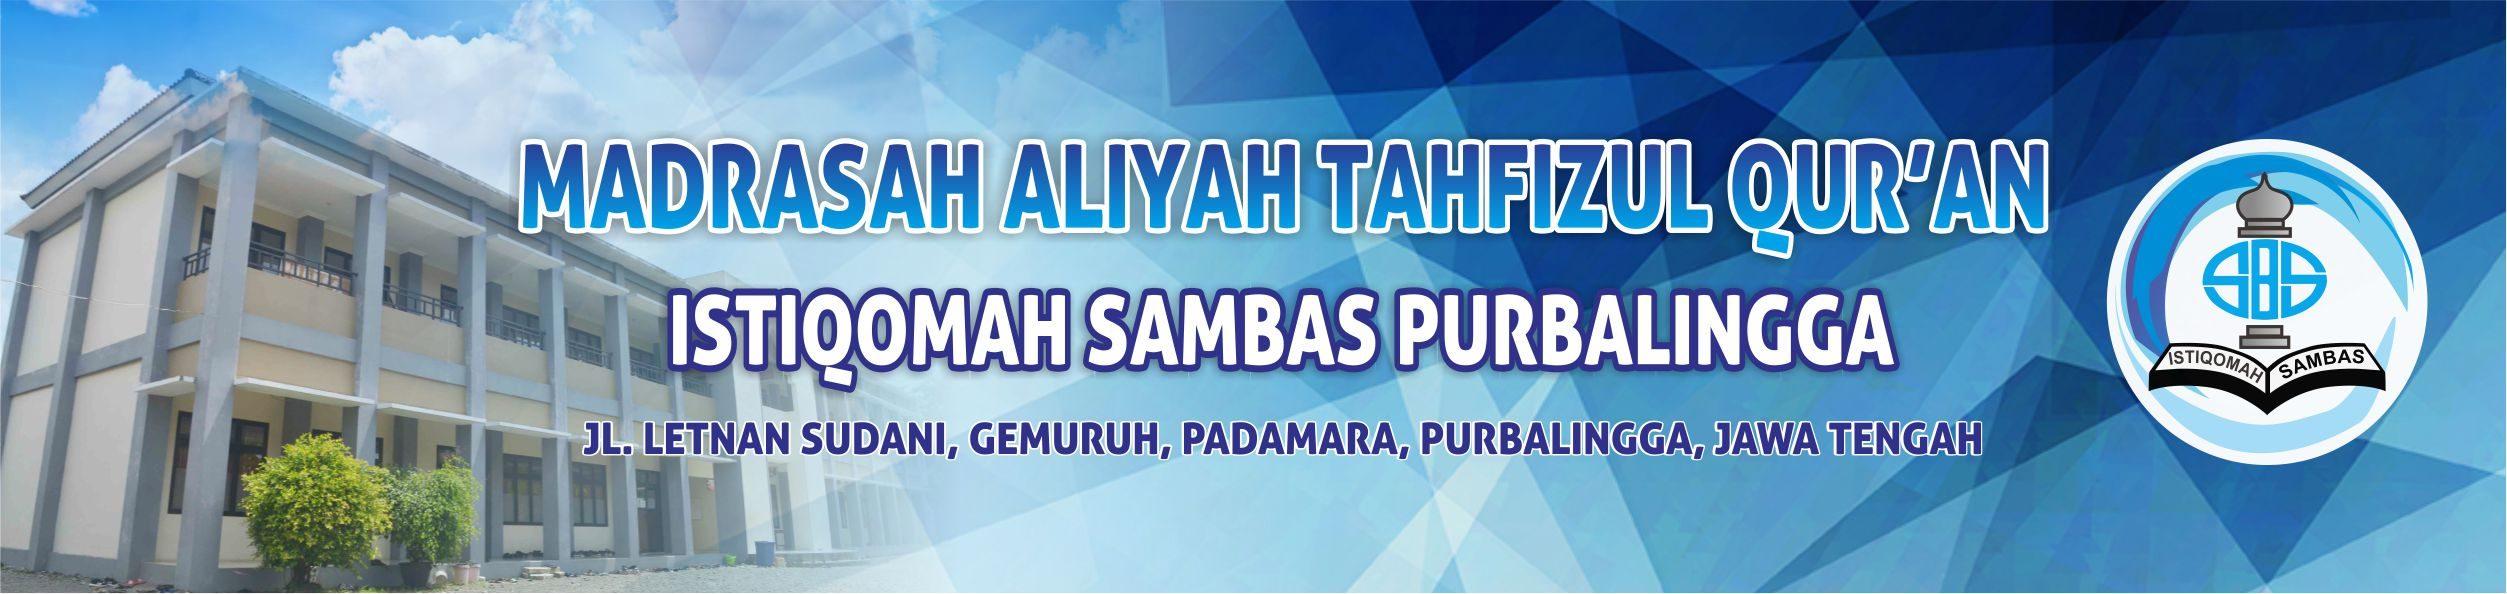 MATIQ ISTIQOMAH SAMBAS | Madrasah 'Aliyah Istiqomah Sambas – Purbalingga